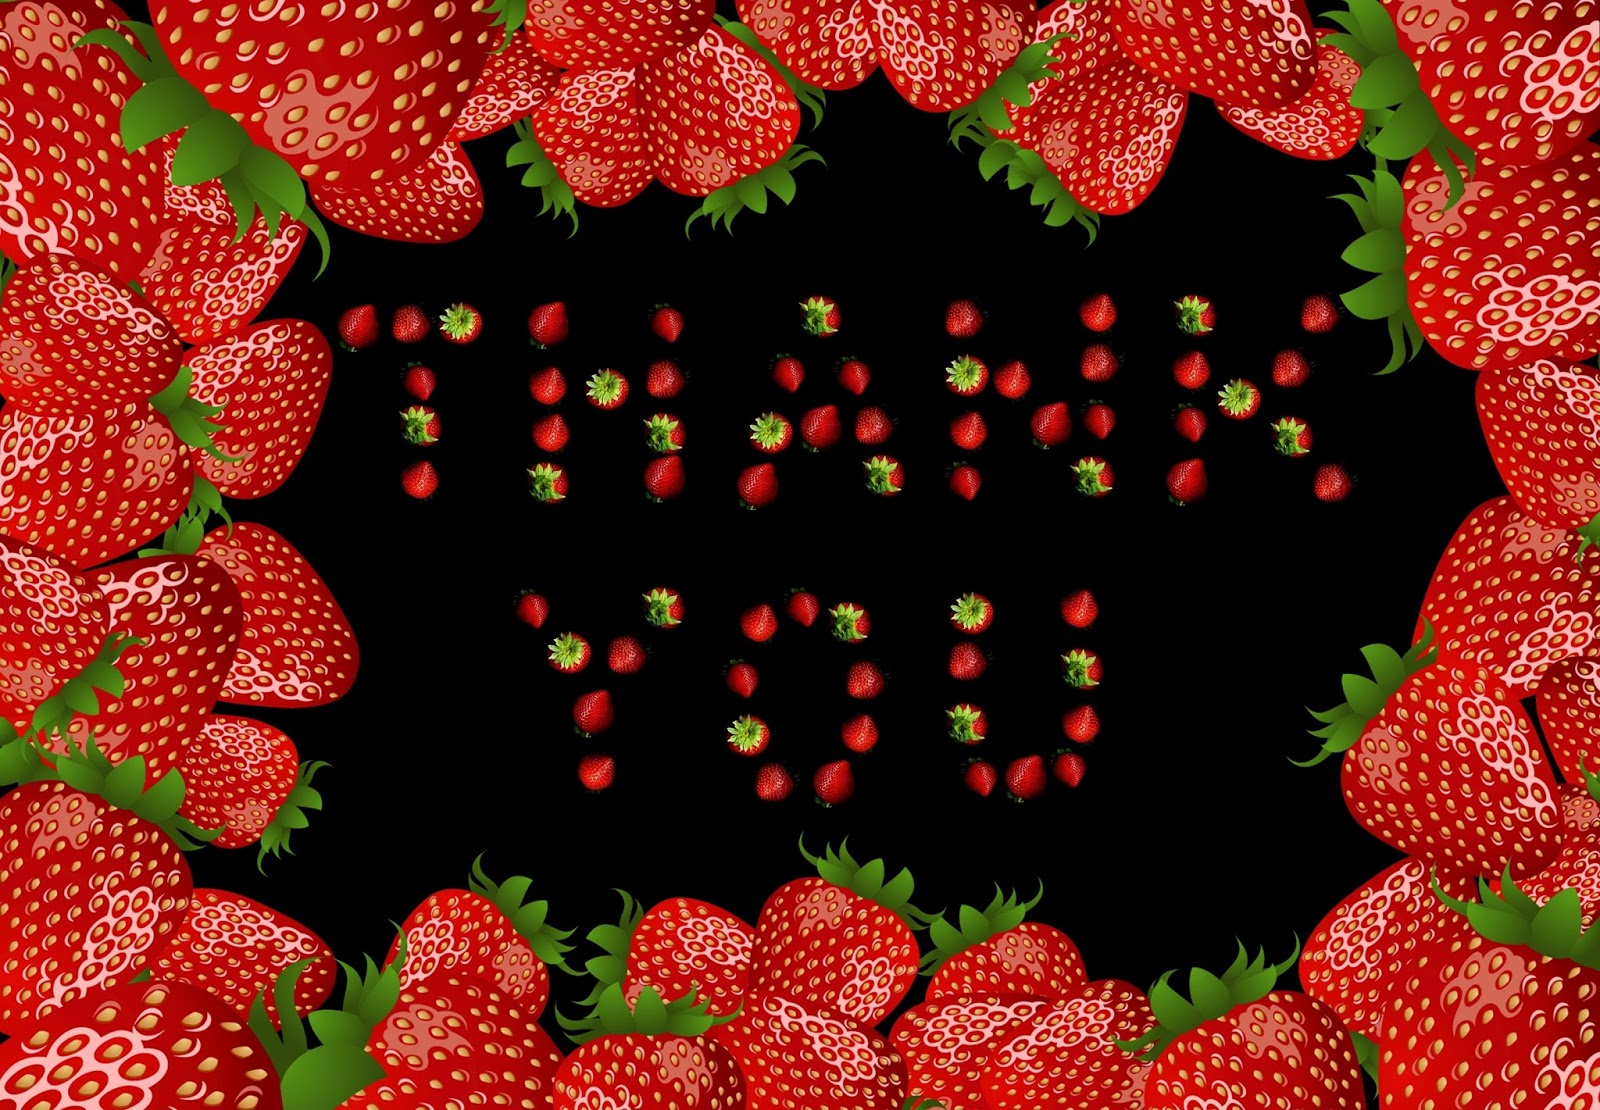 Strawberries Beautiful Thank You Pics